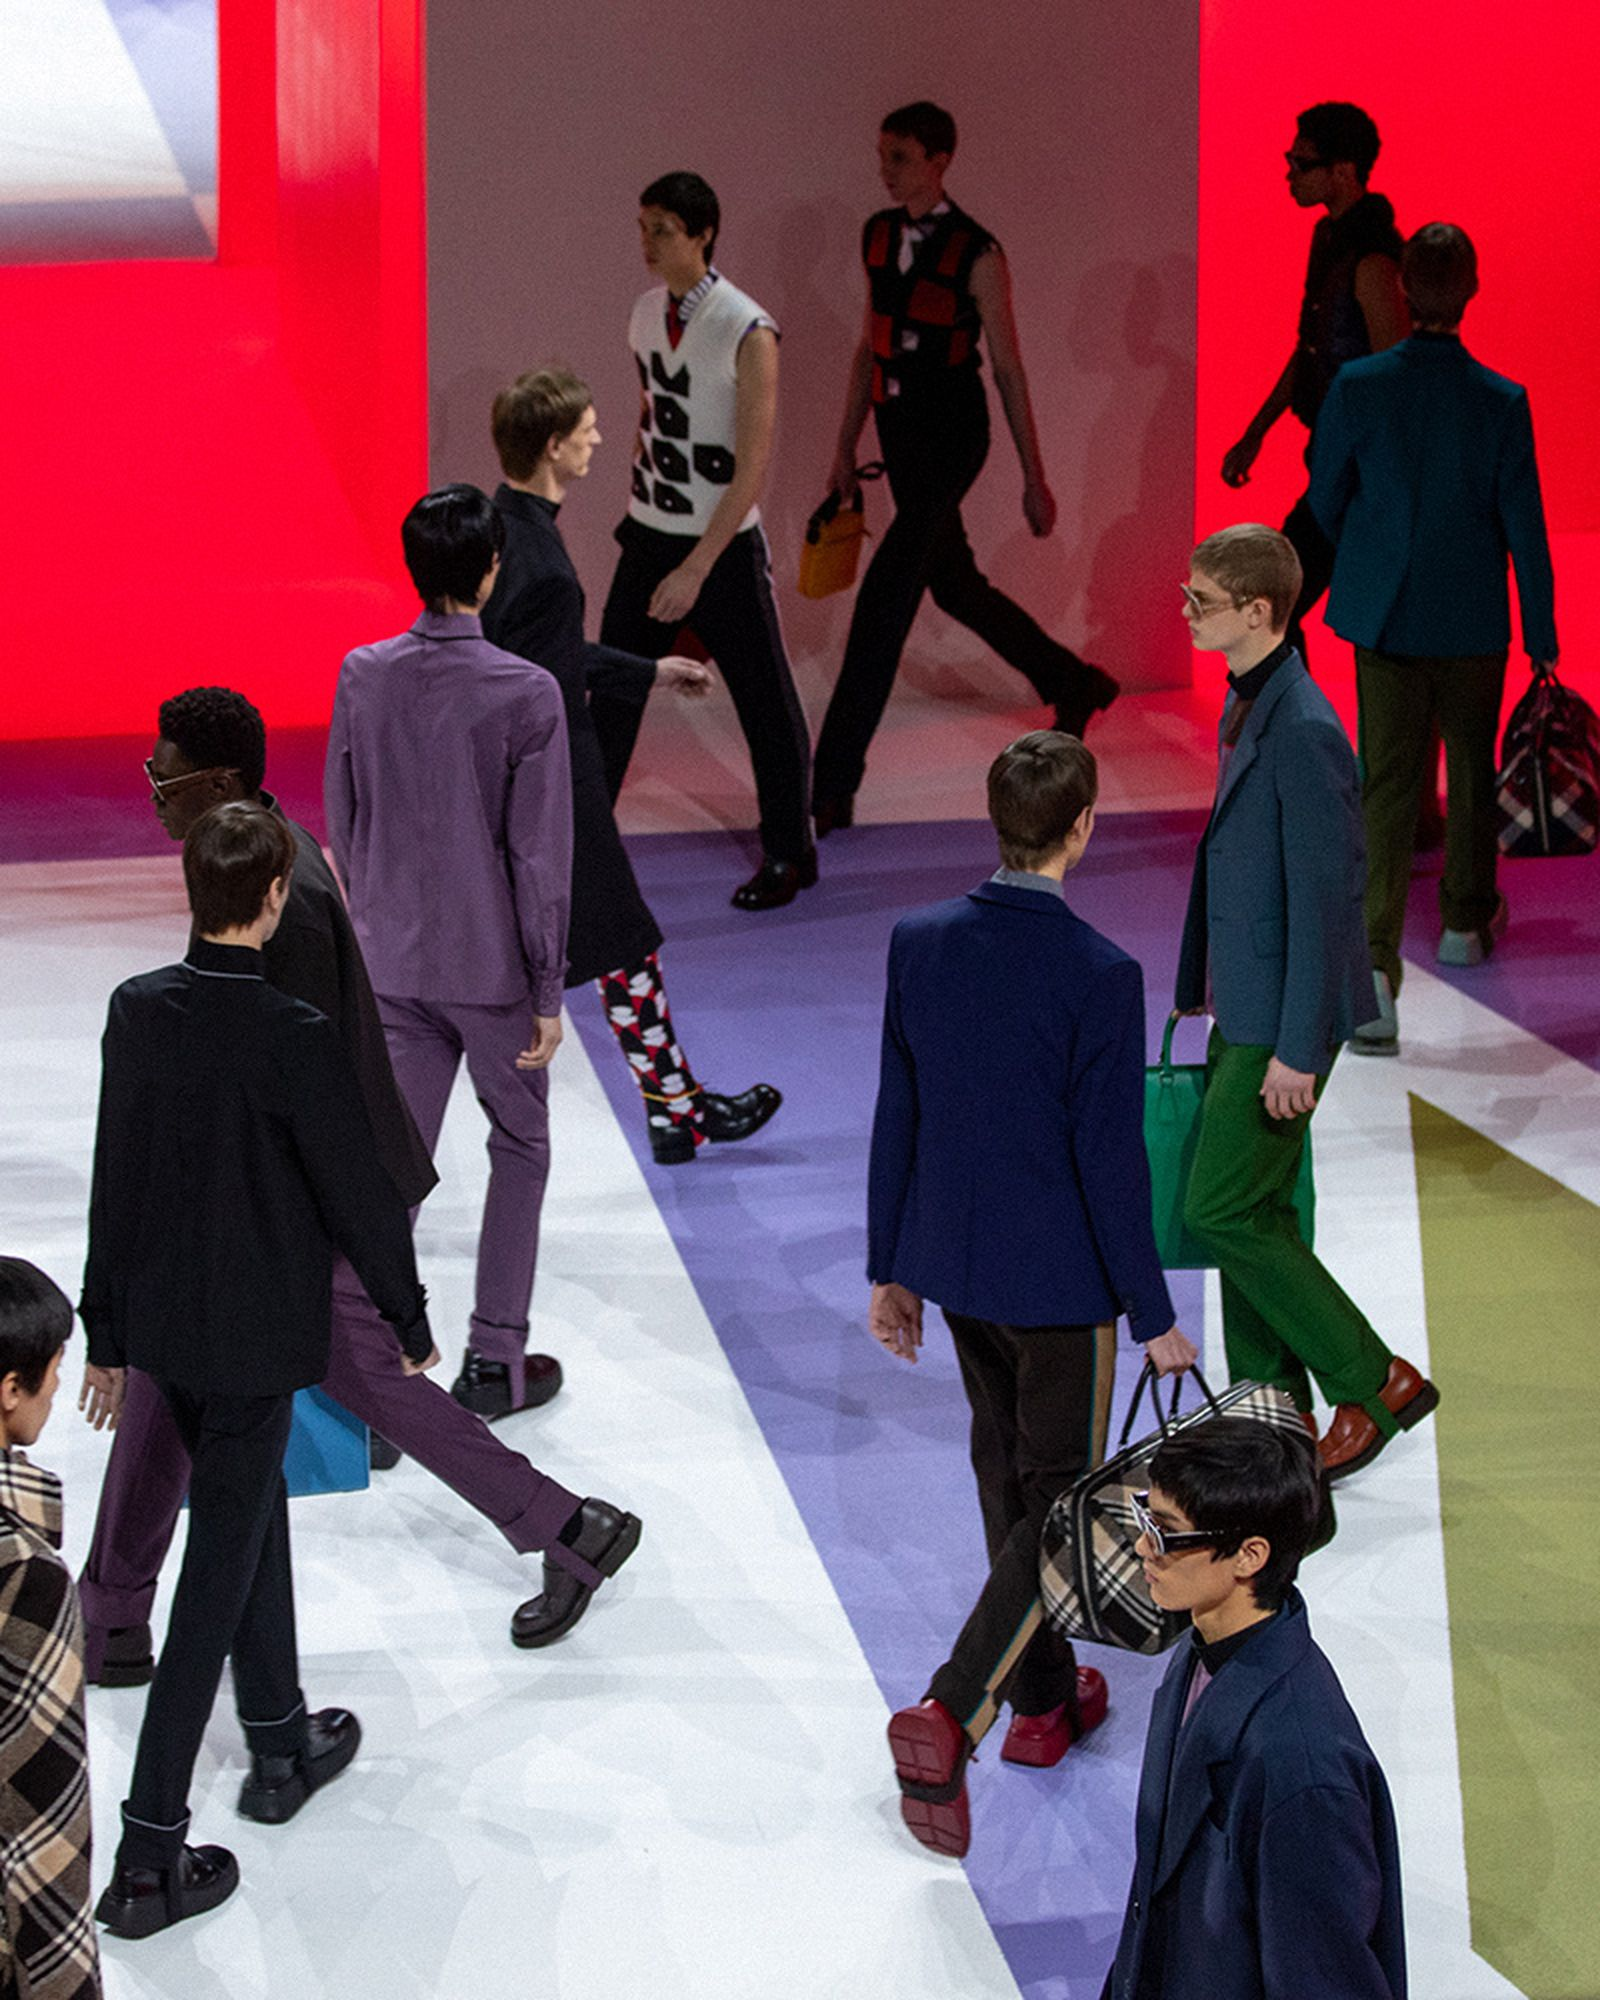 fashion-world-post-corona-industry-01